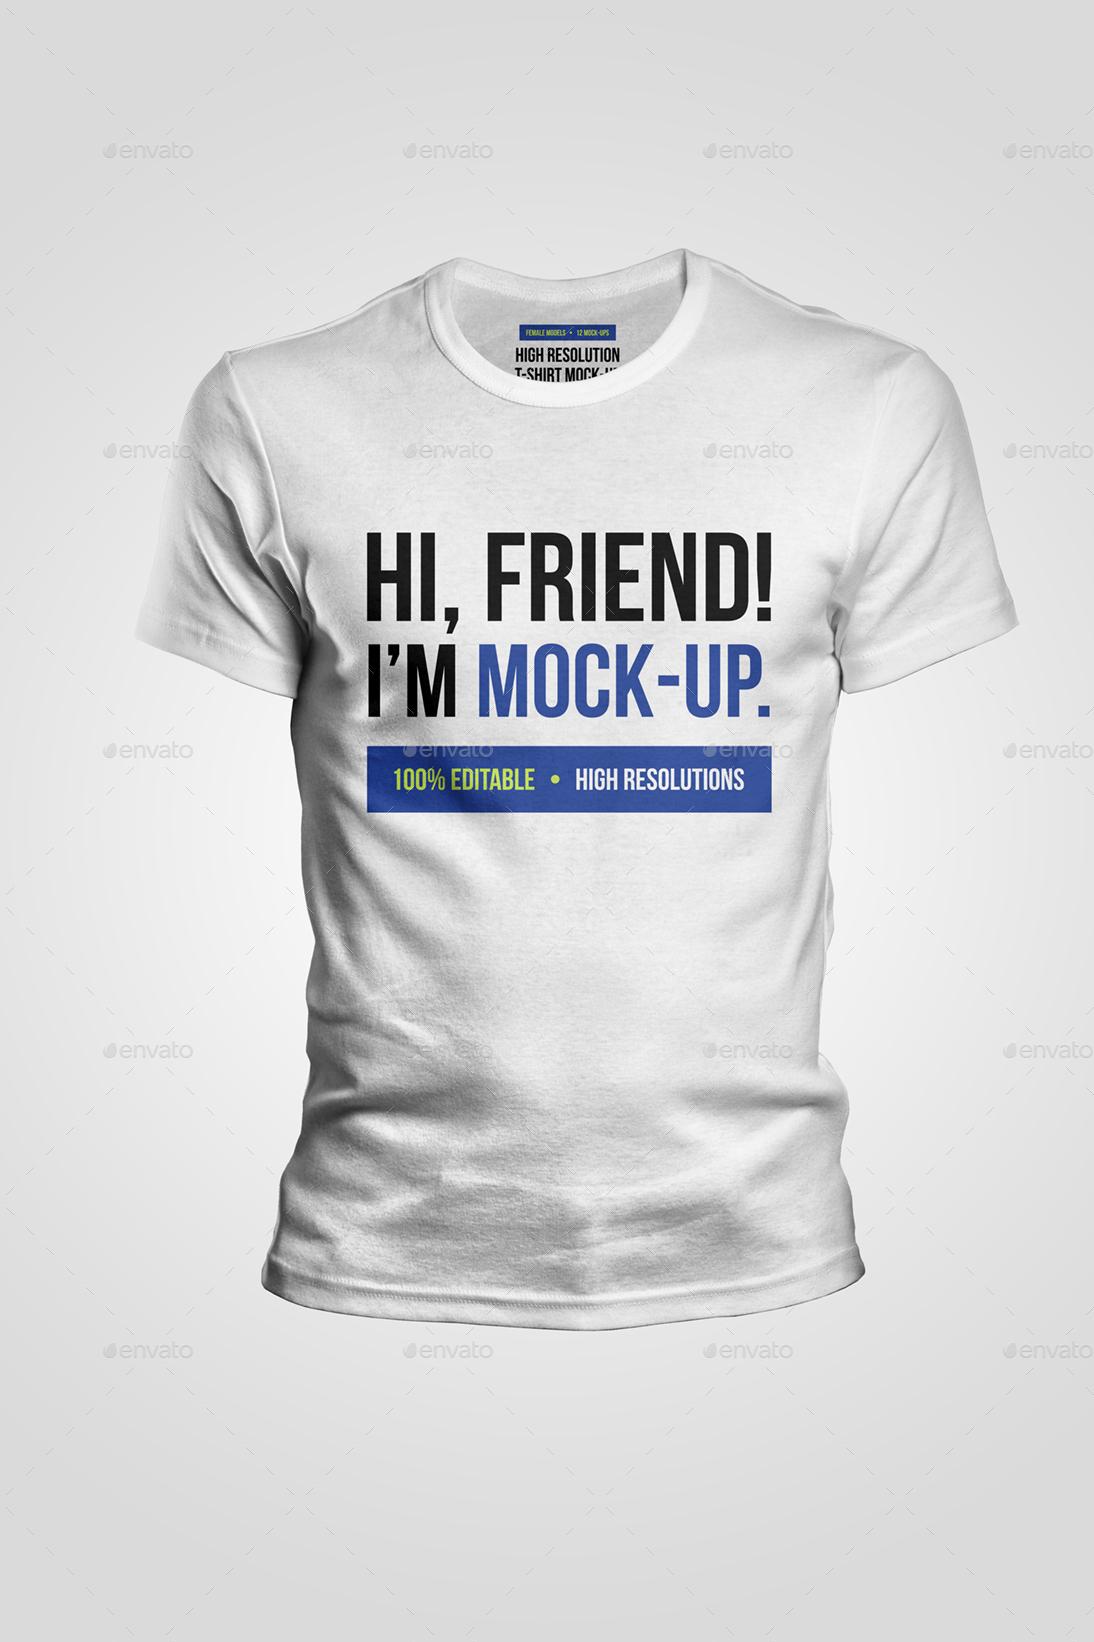 t shirt mockups